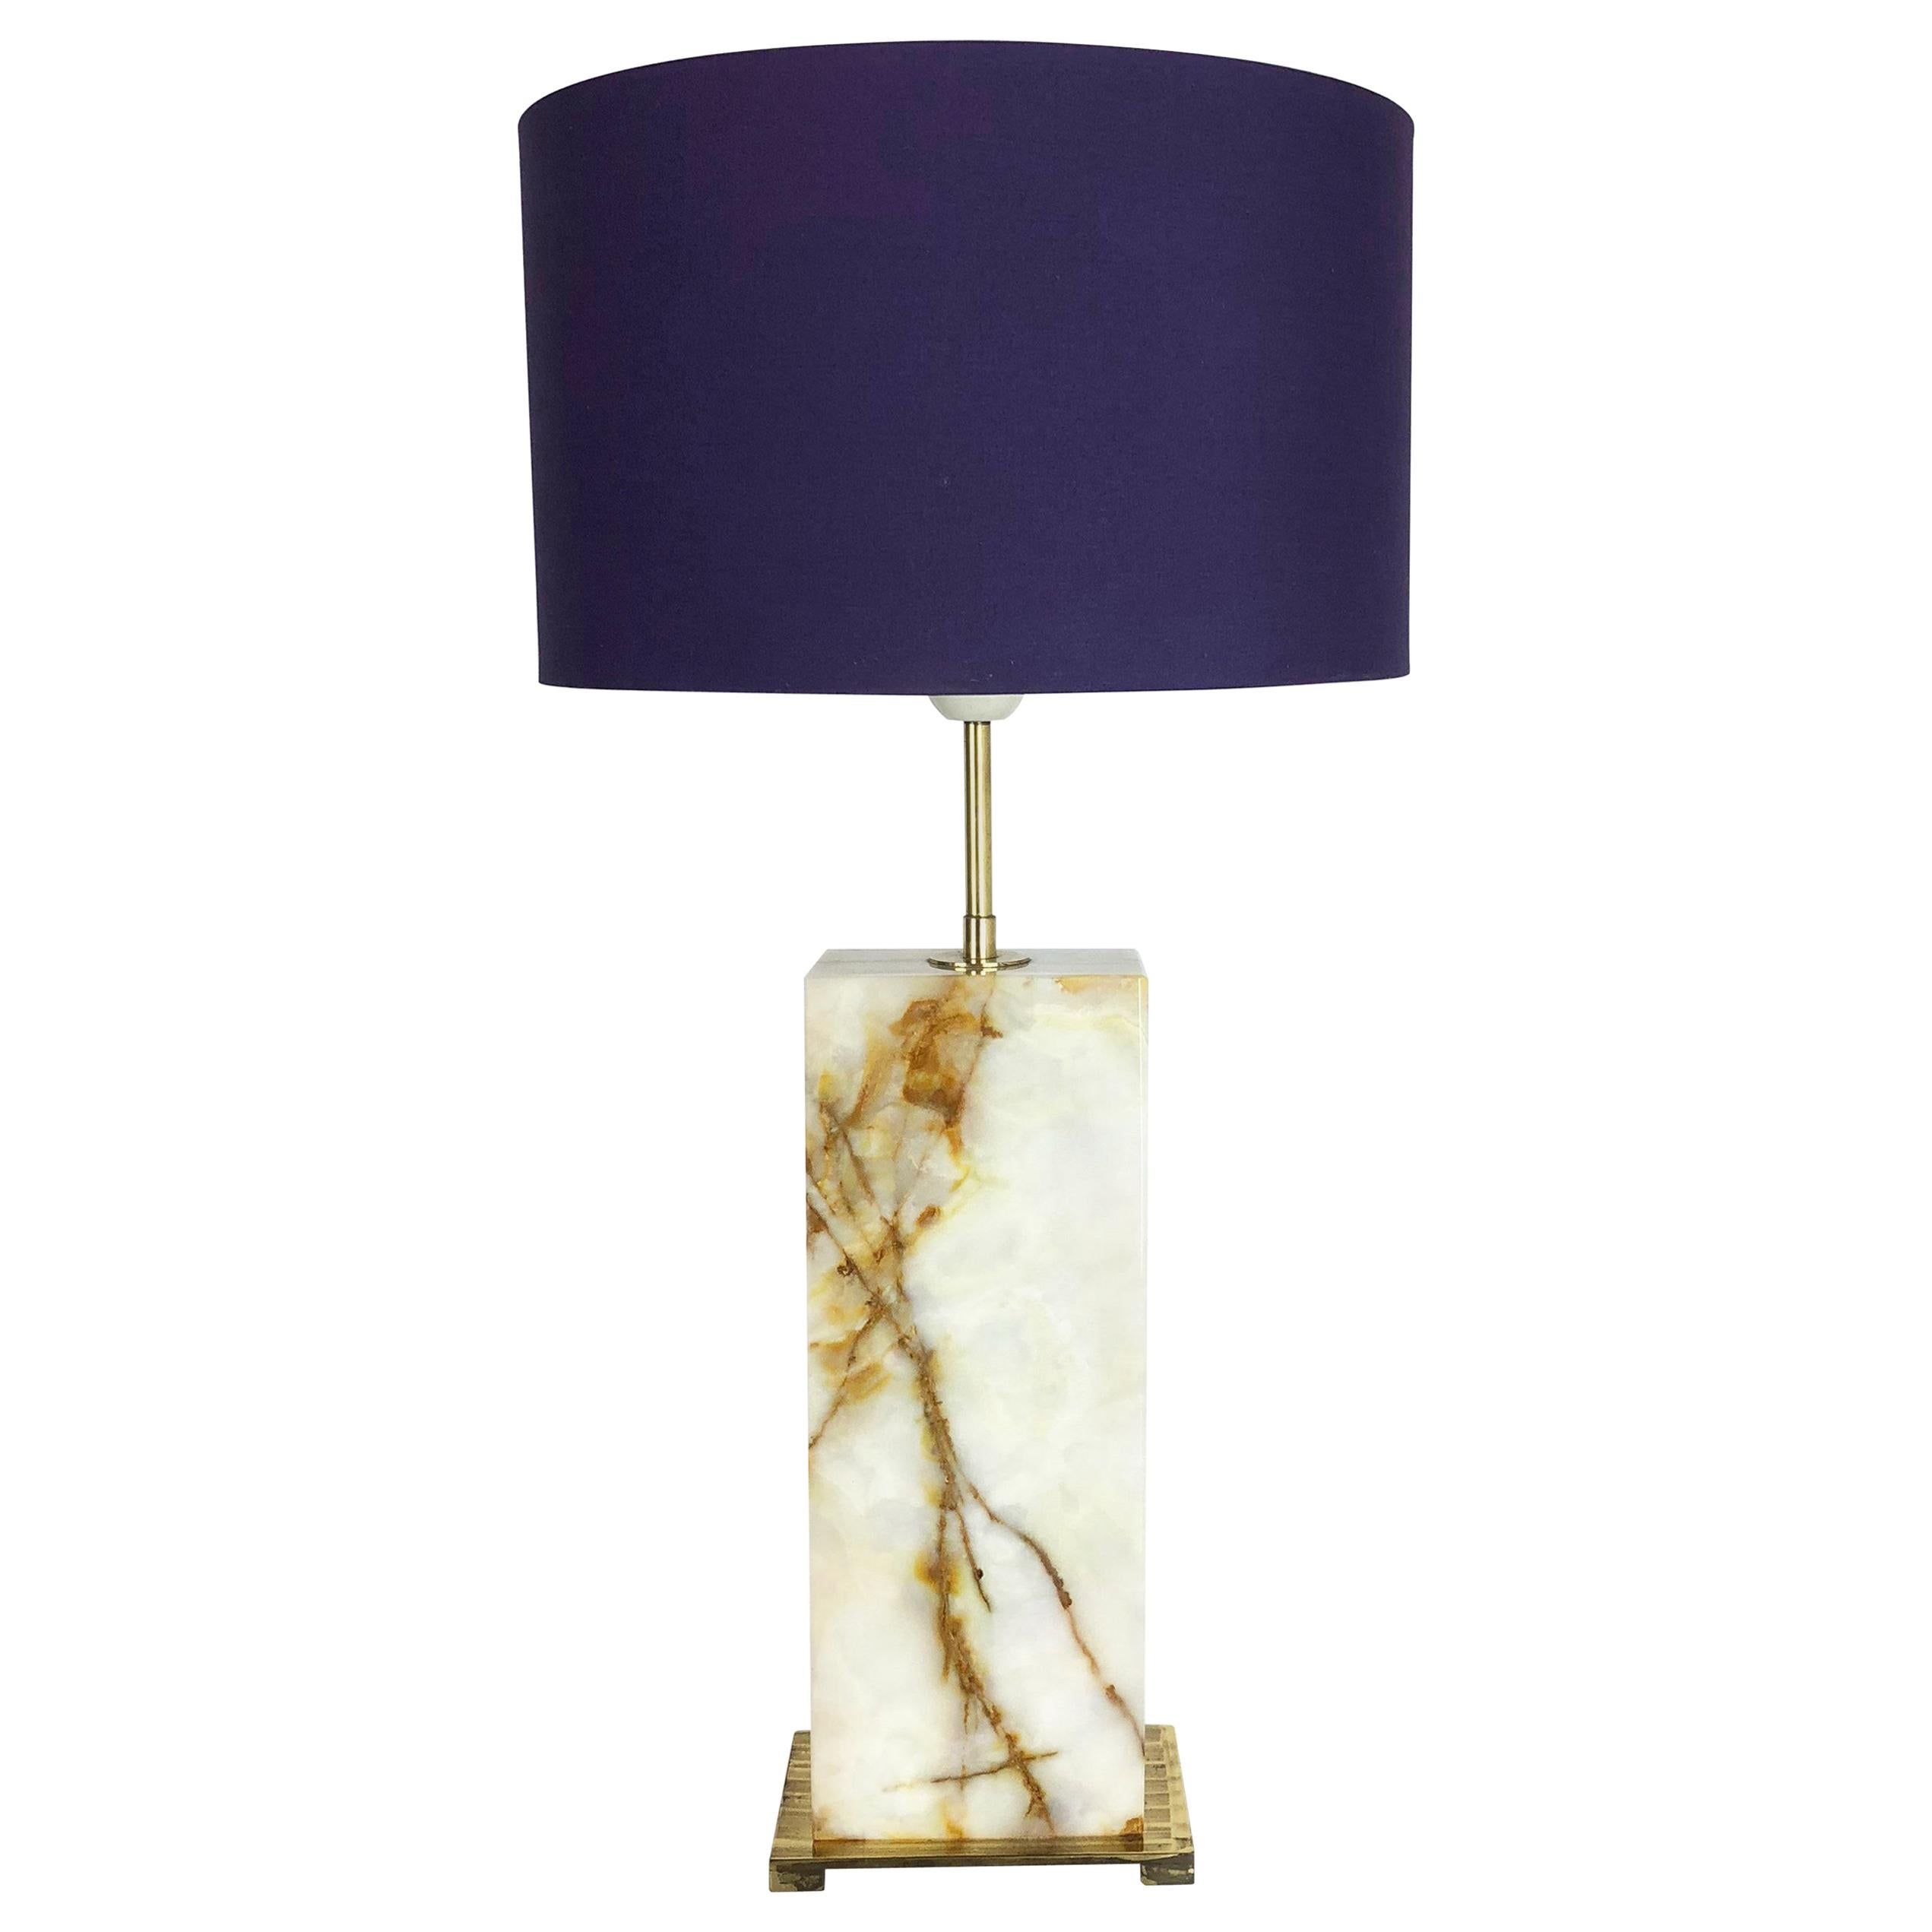 Vintage Hollywood Regency Onyx Marble Light Base Table Light, Italy, 1960s